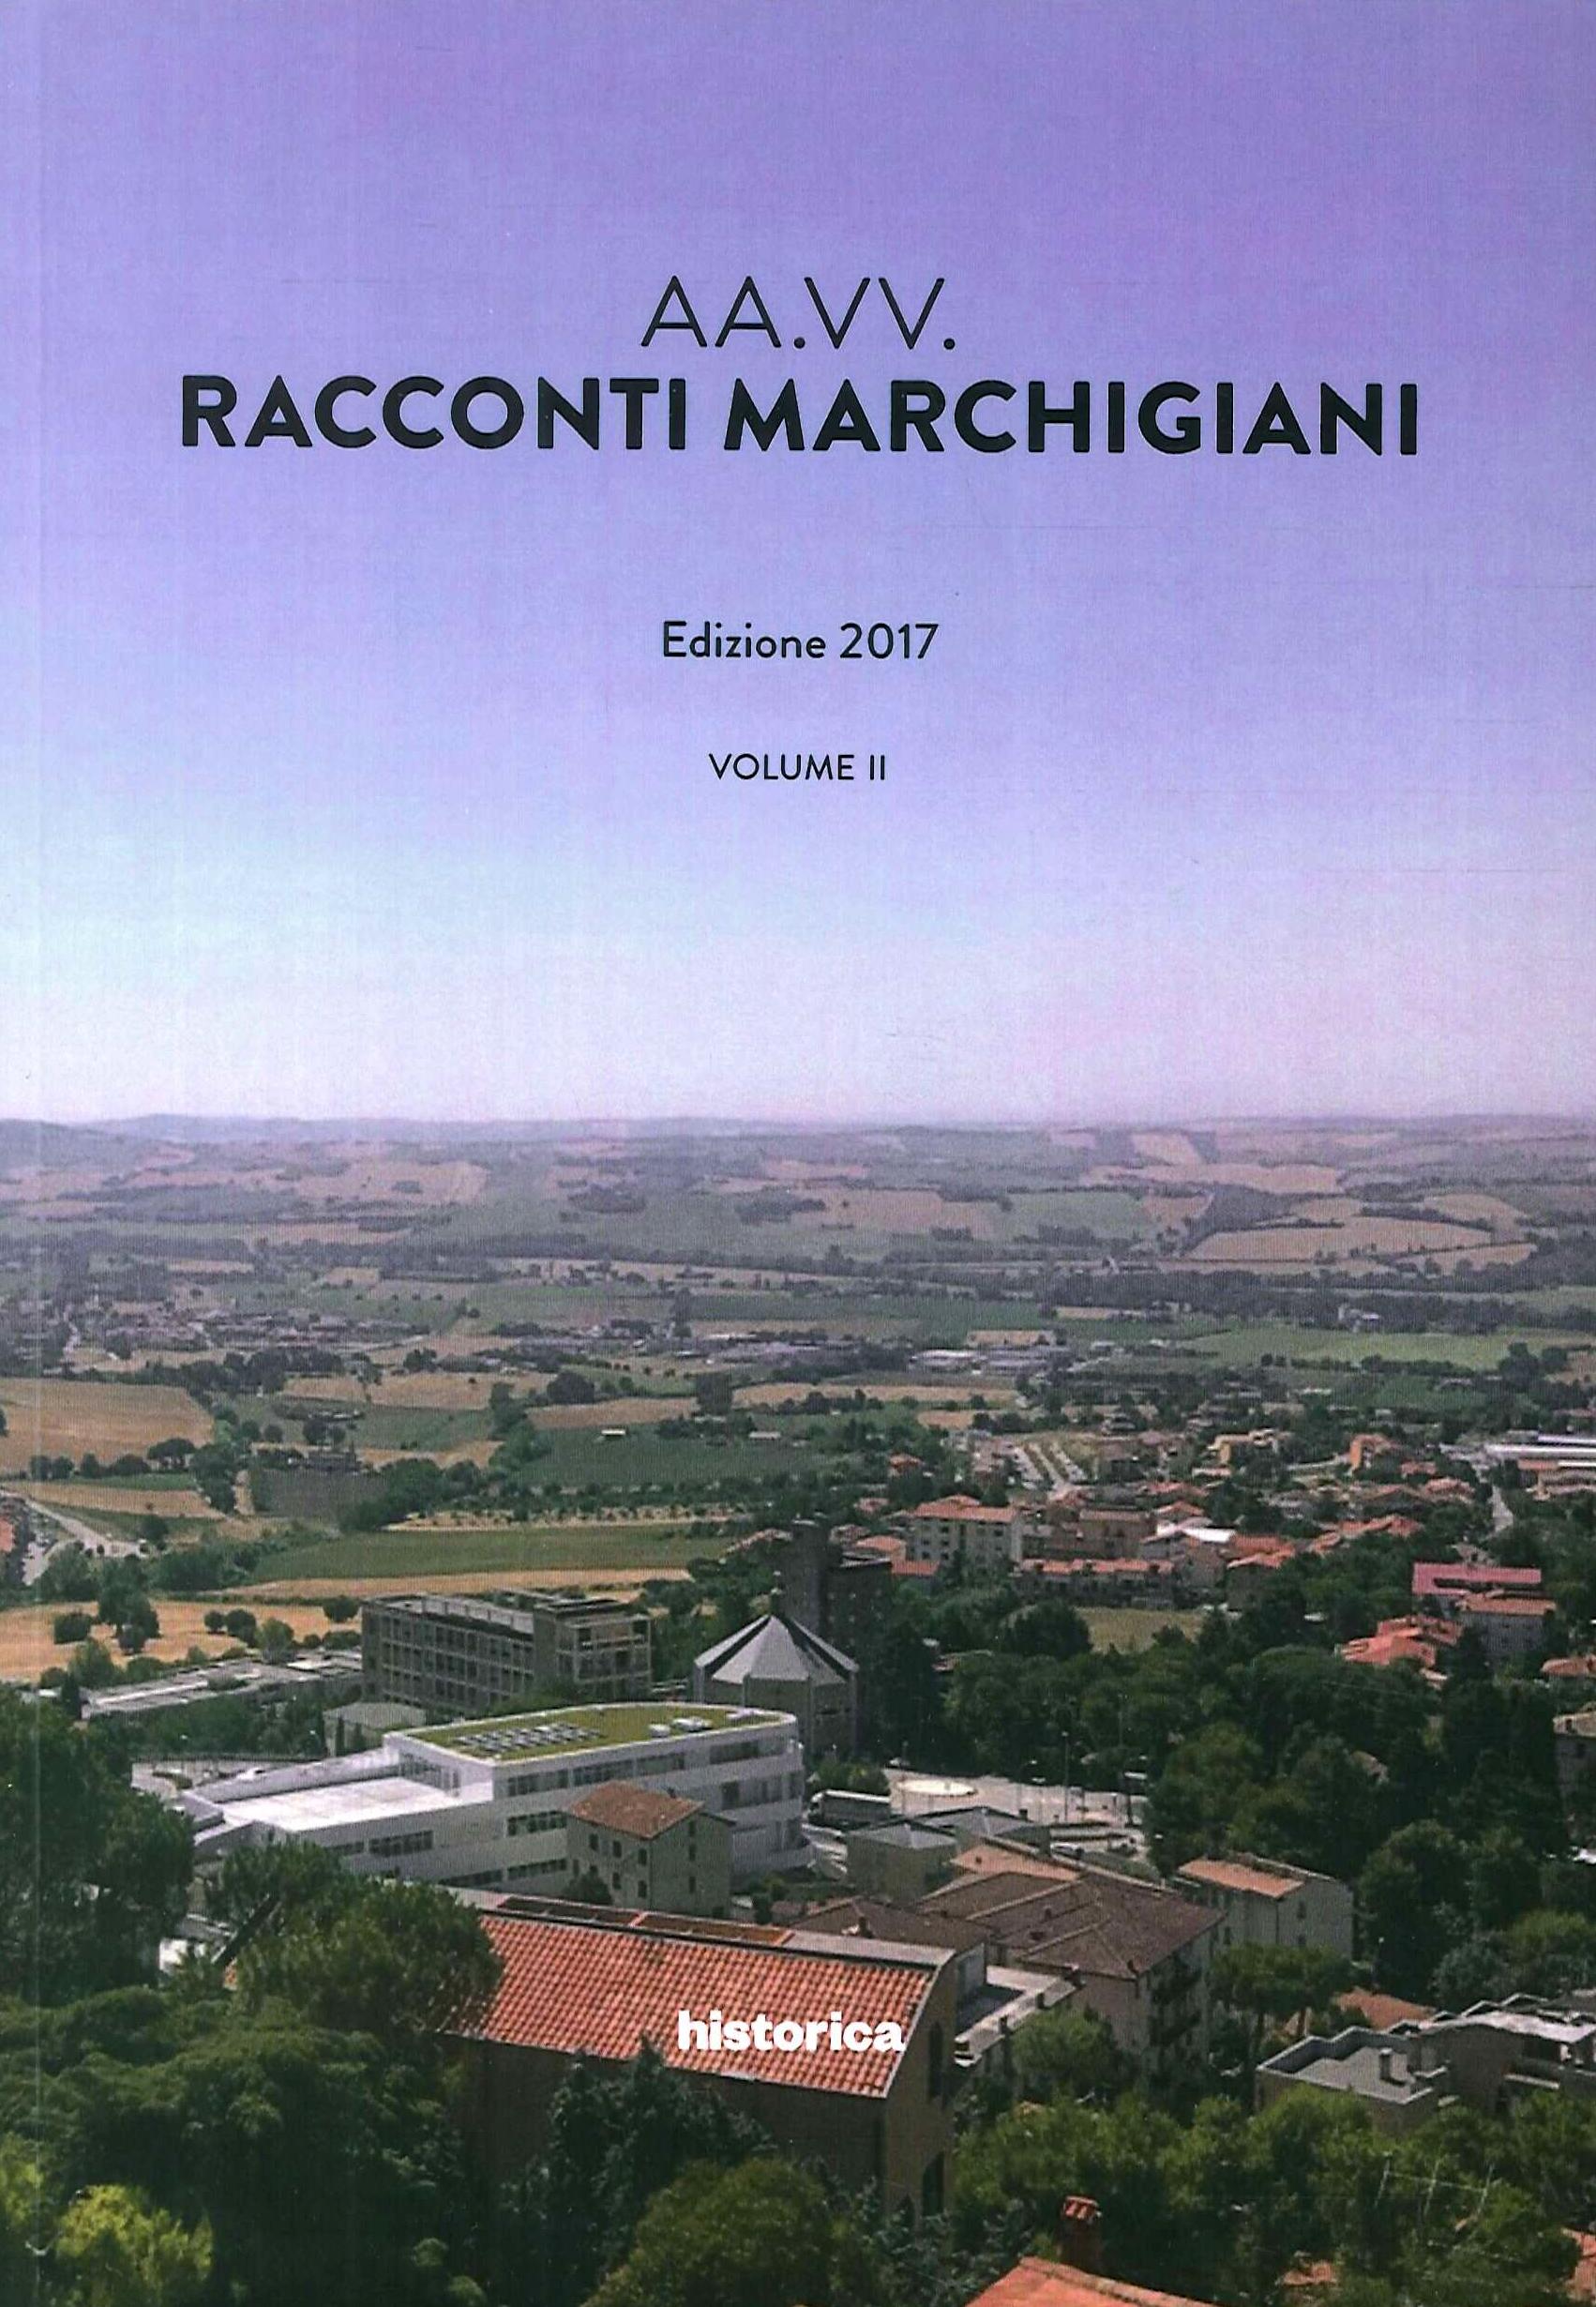 Racconti marchigiani. Vol. 2